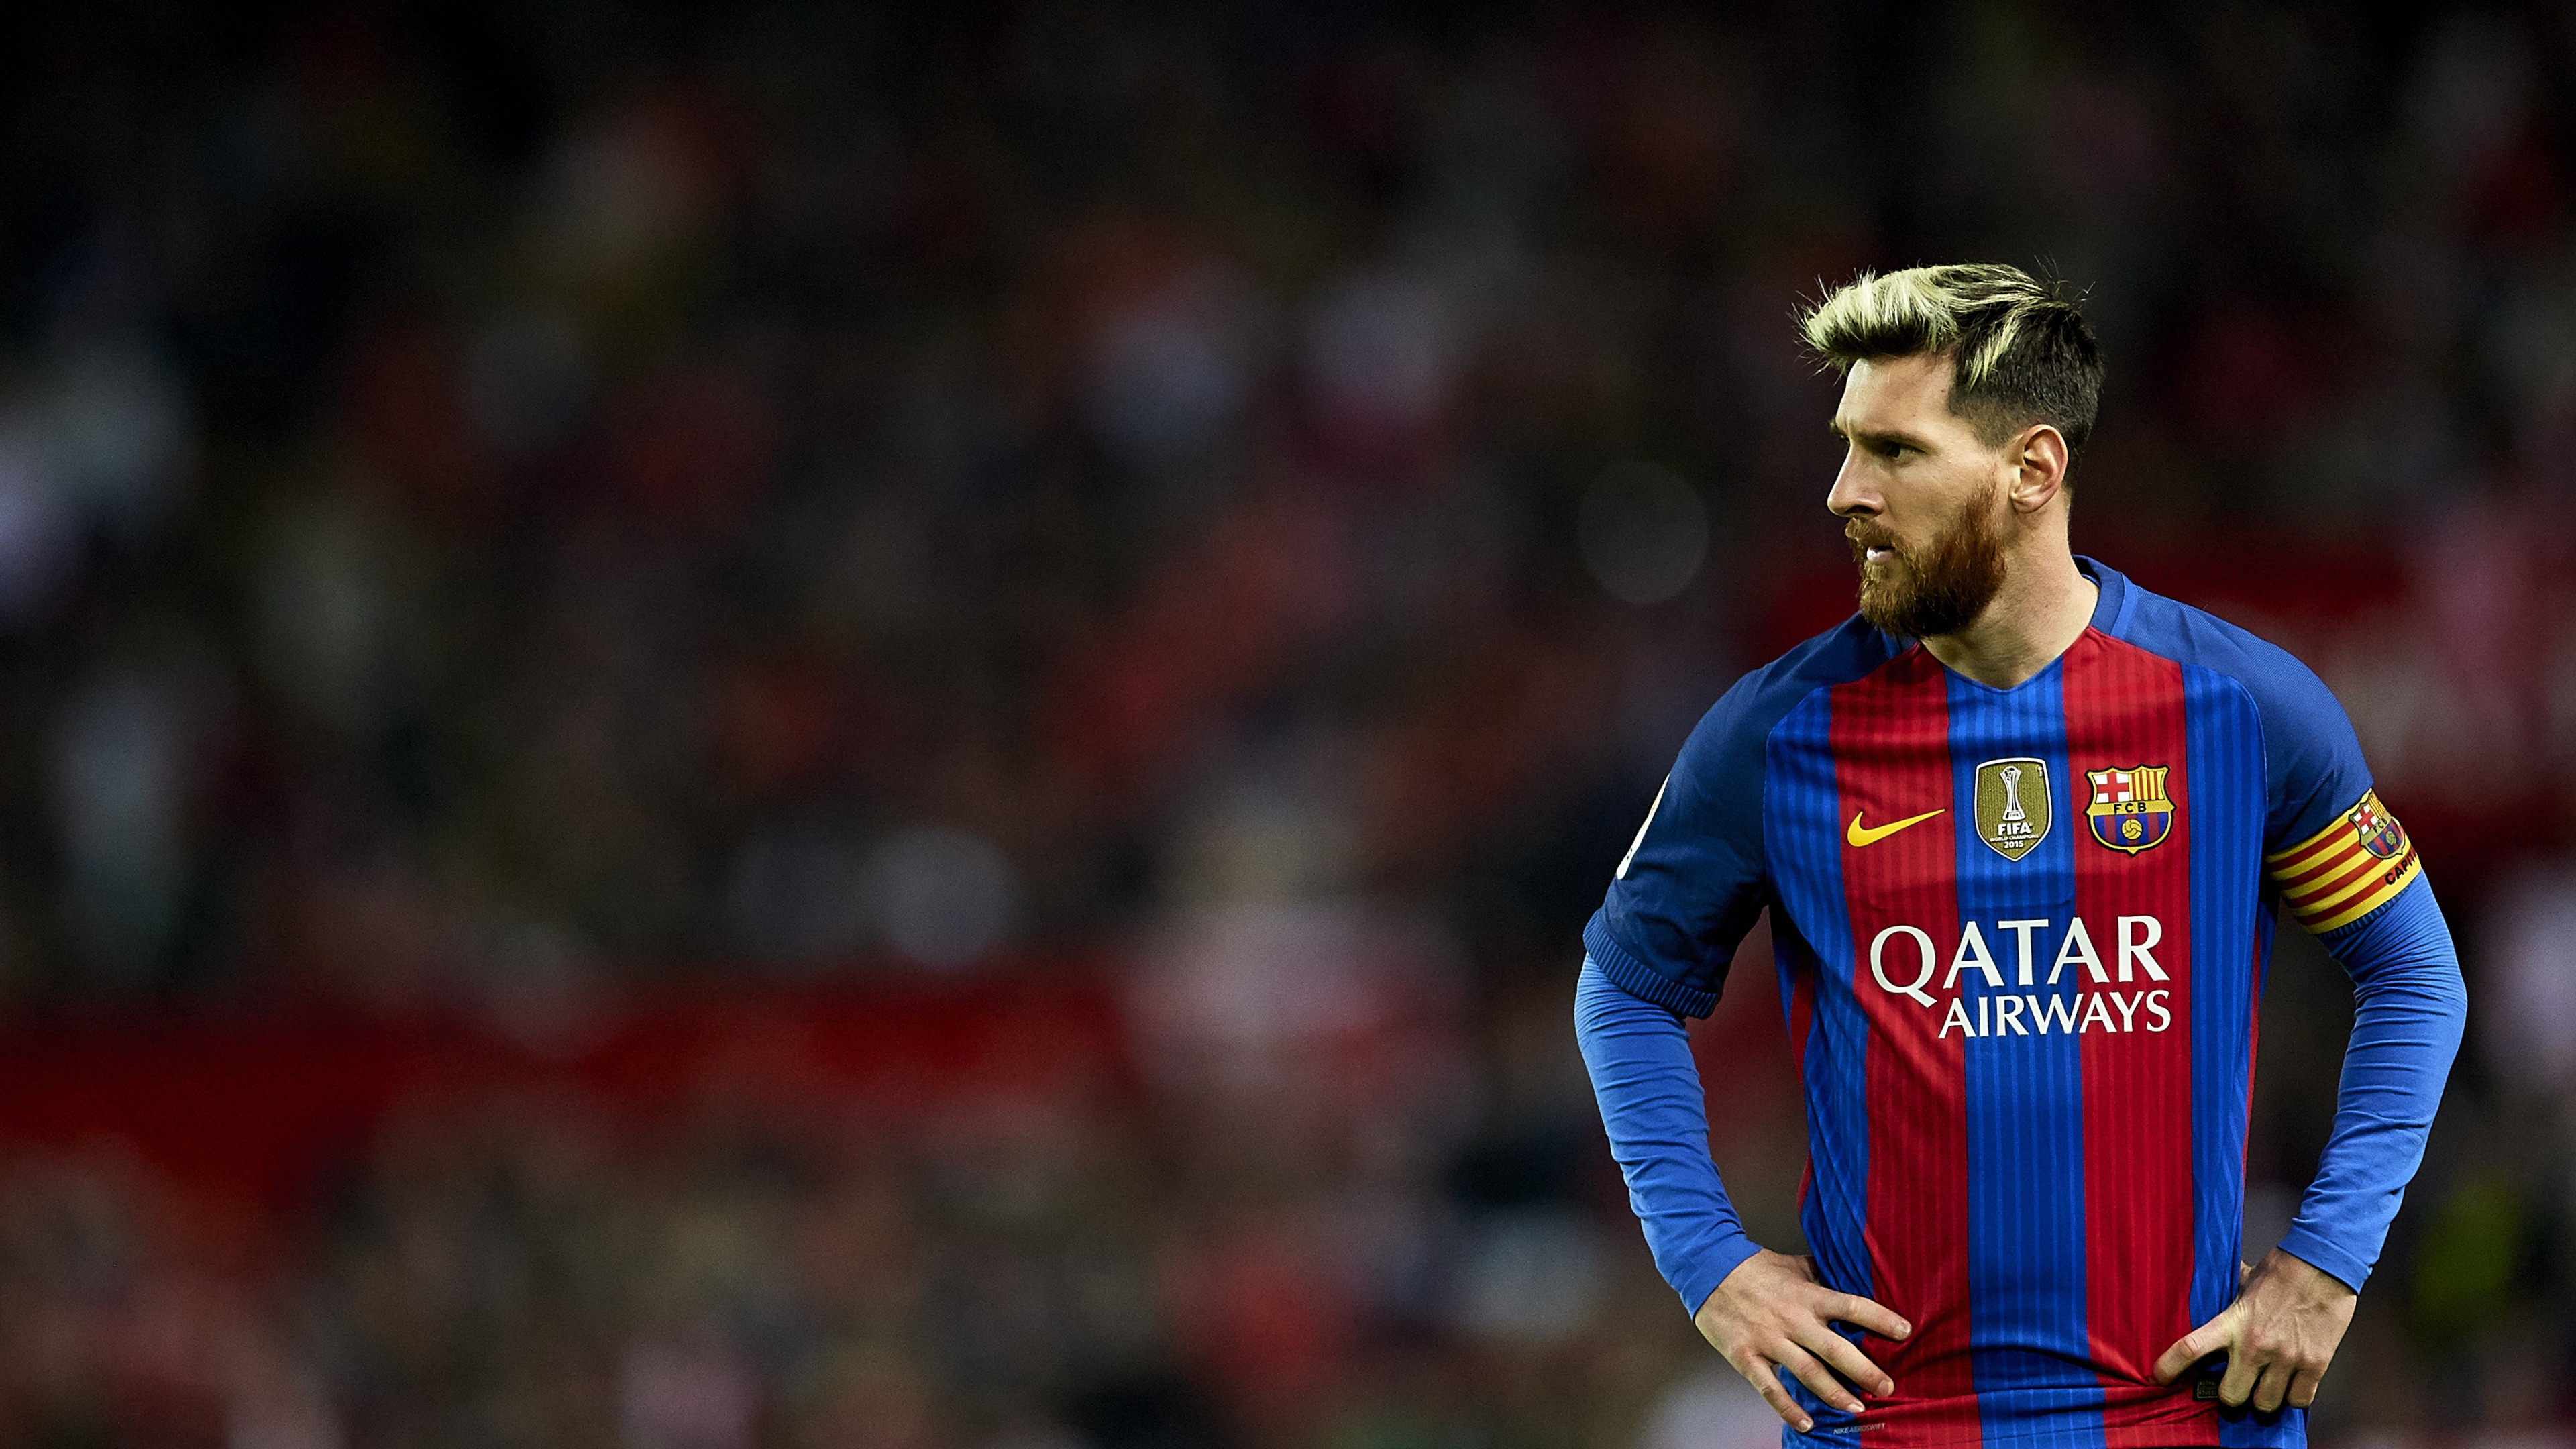 2k - Ultra Hd Leo Messi Hd , HD Wallpaper & Backgrounds